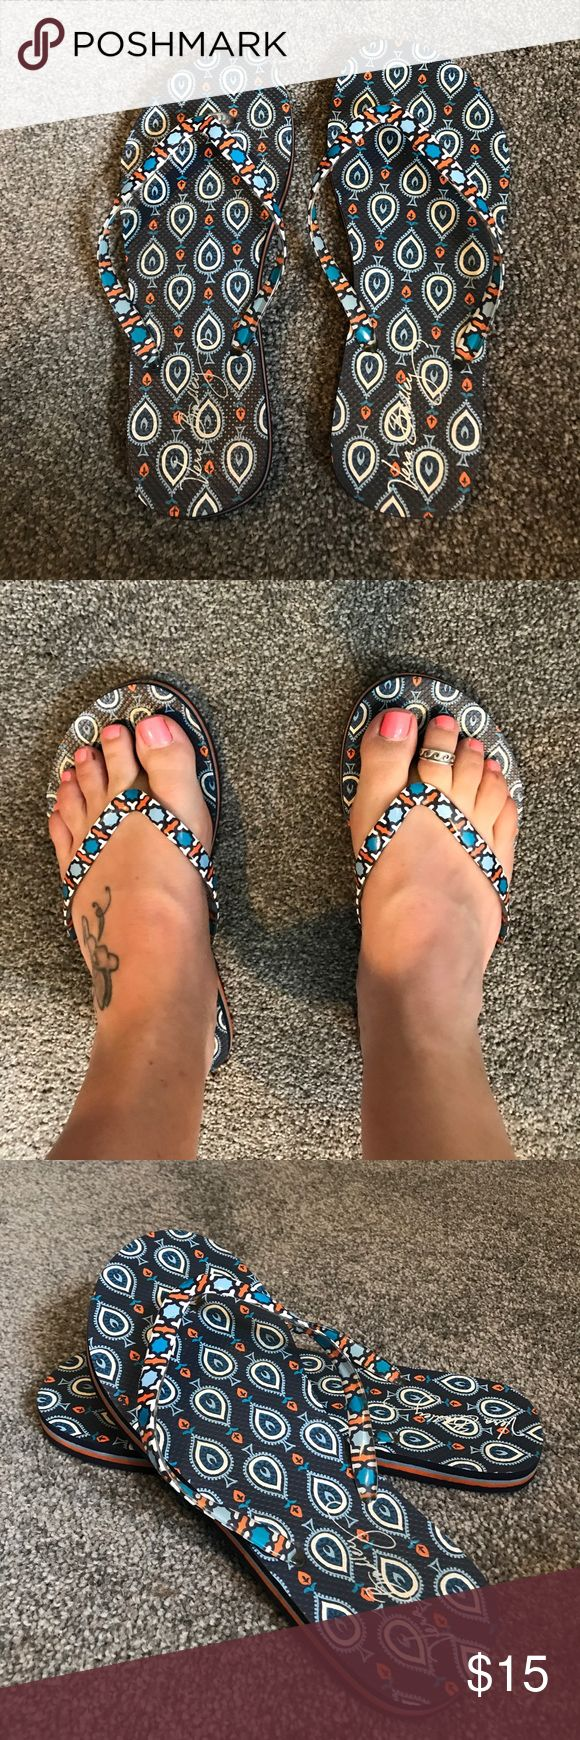 Vera Bradley flip-flops Blue, orange and white flip-flops size 7-8. Barely worn, Great condition. Super cute!! Vera Bradley Shoes Sandals